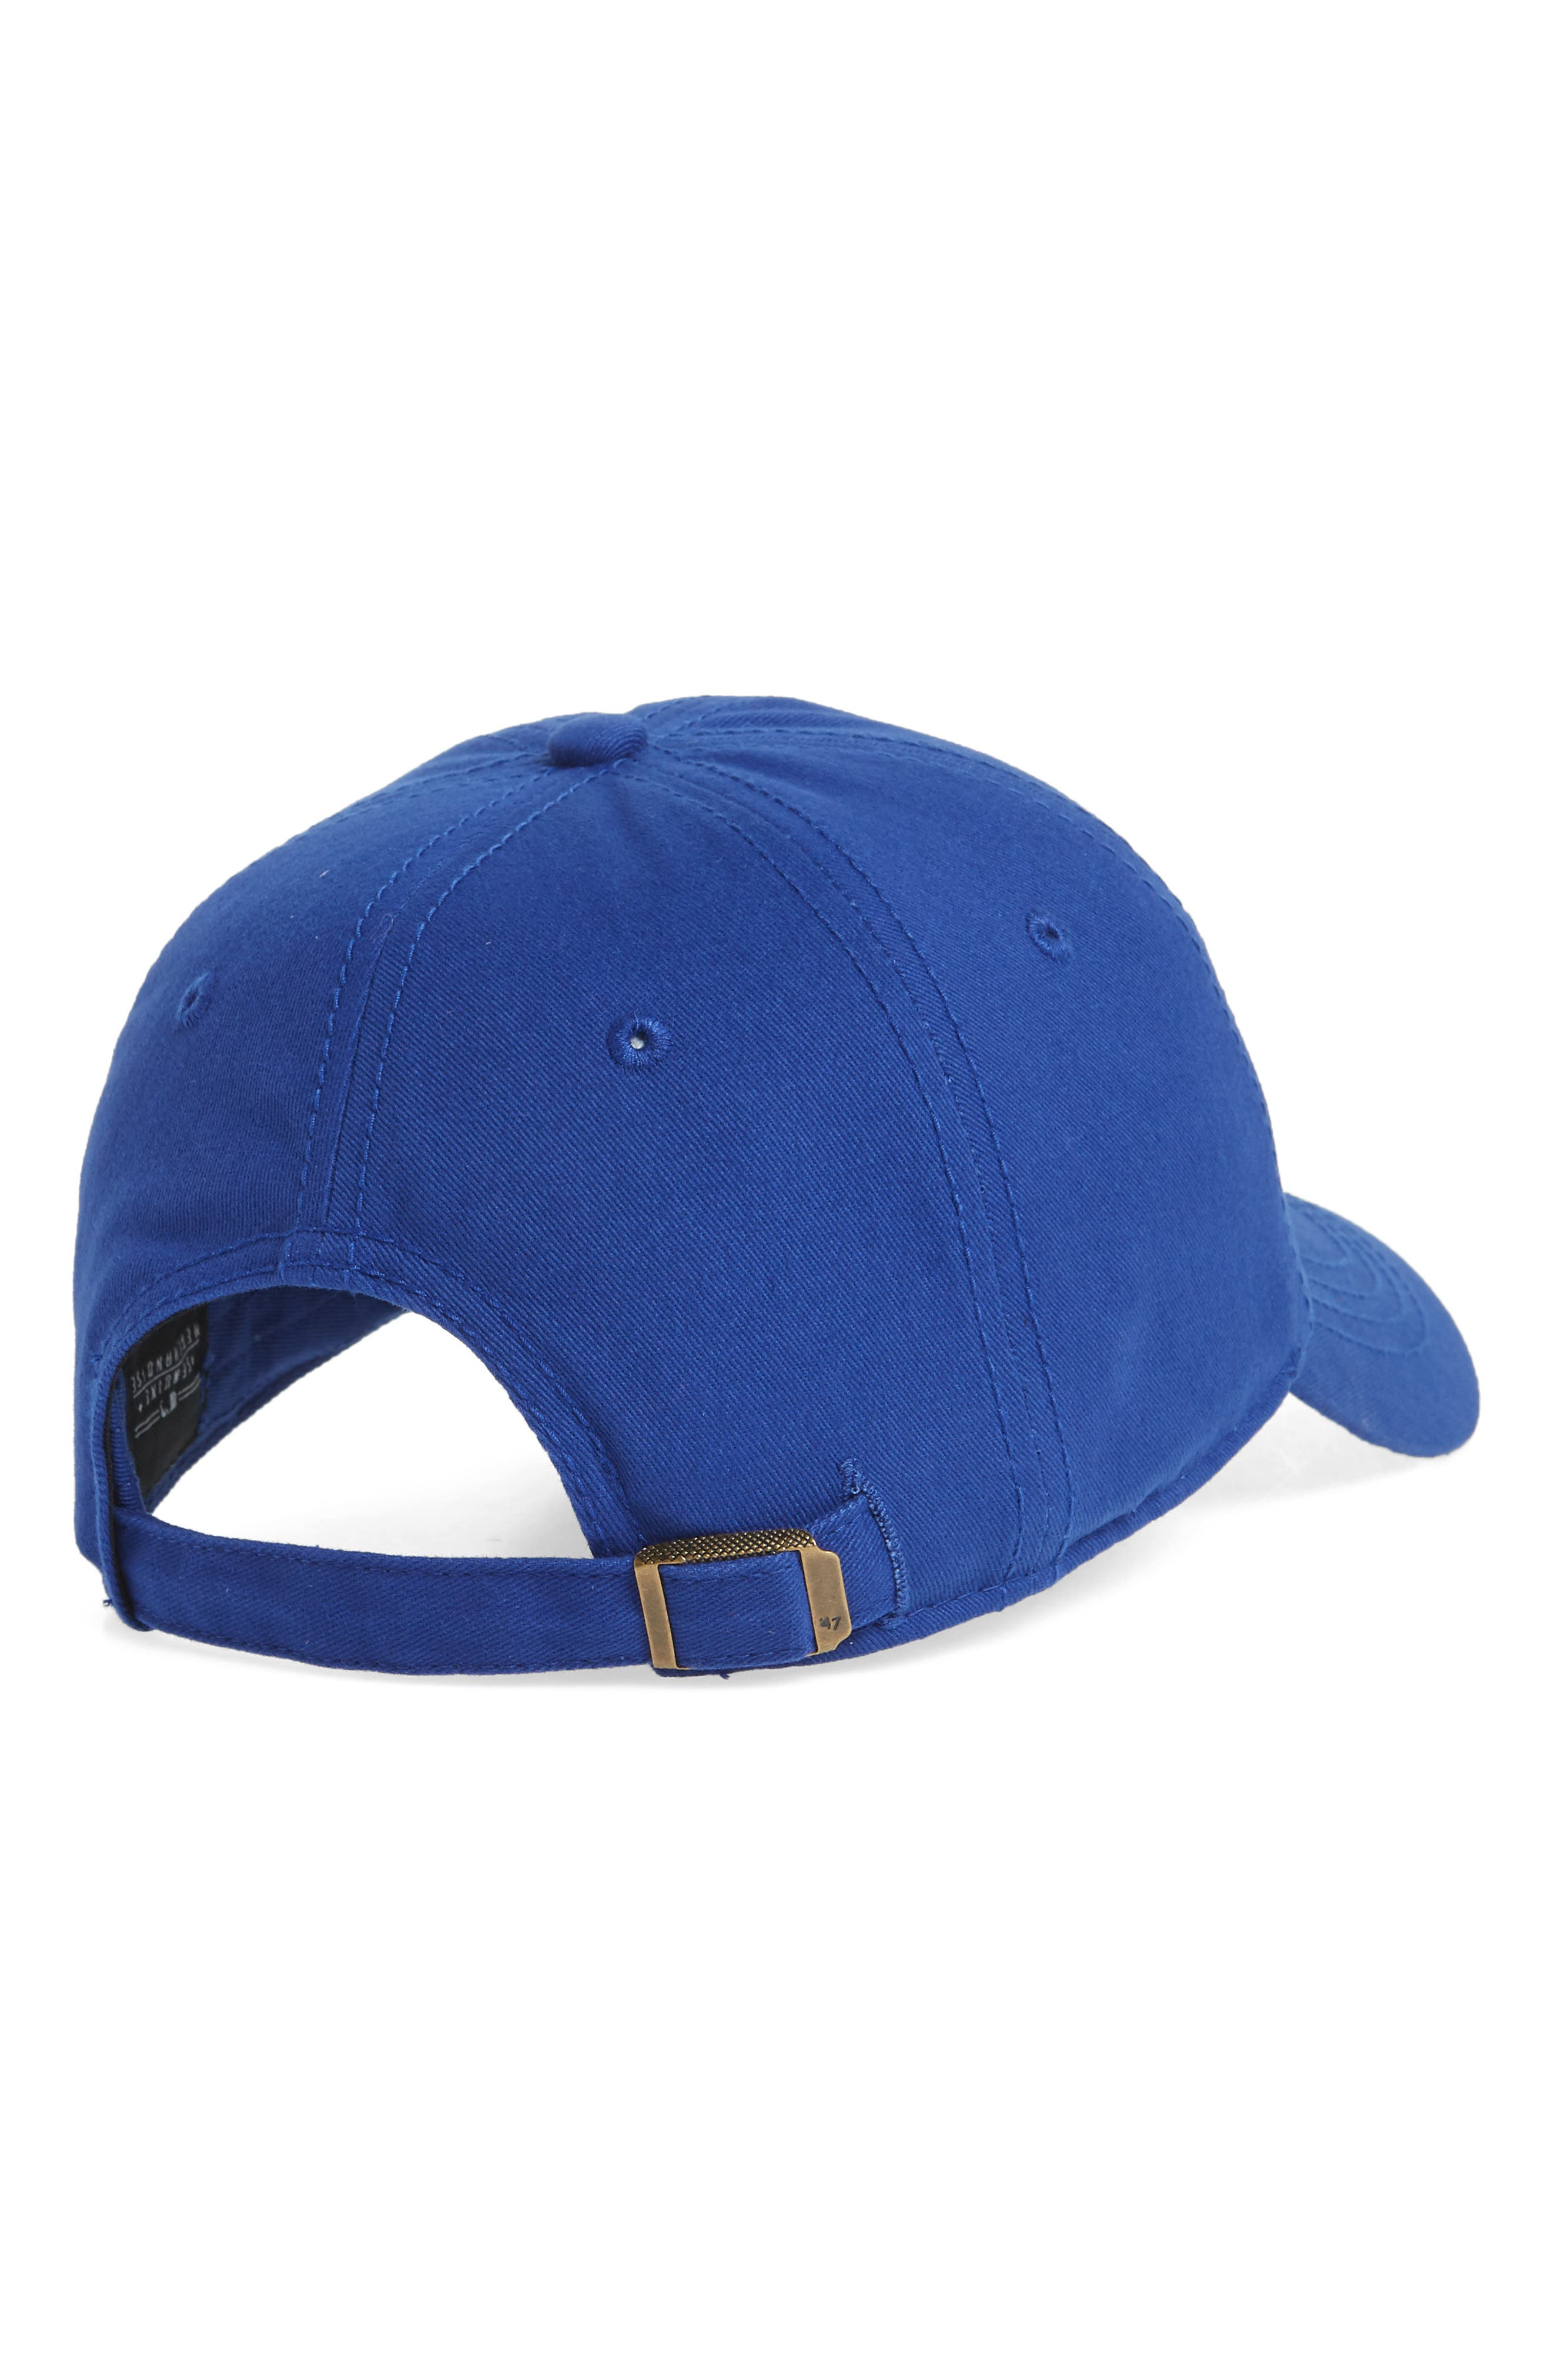 Miata Clean-Up Texas Rangers Baseball Cap,                             Alternate thumbnail 2, color,                             400